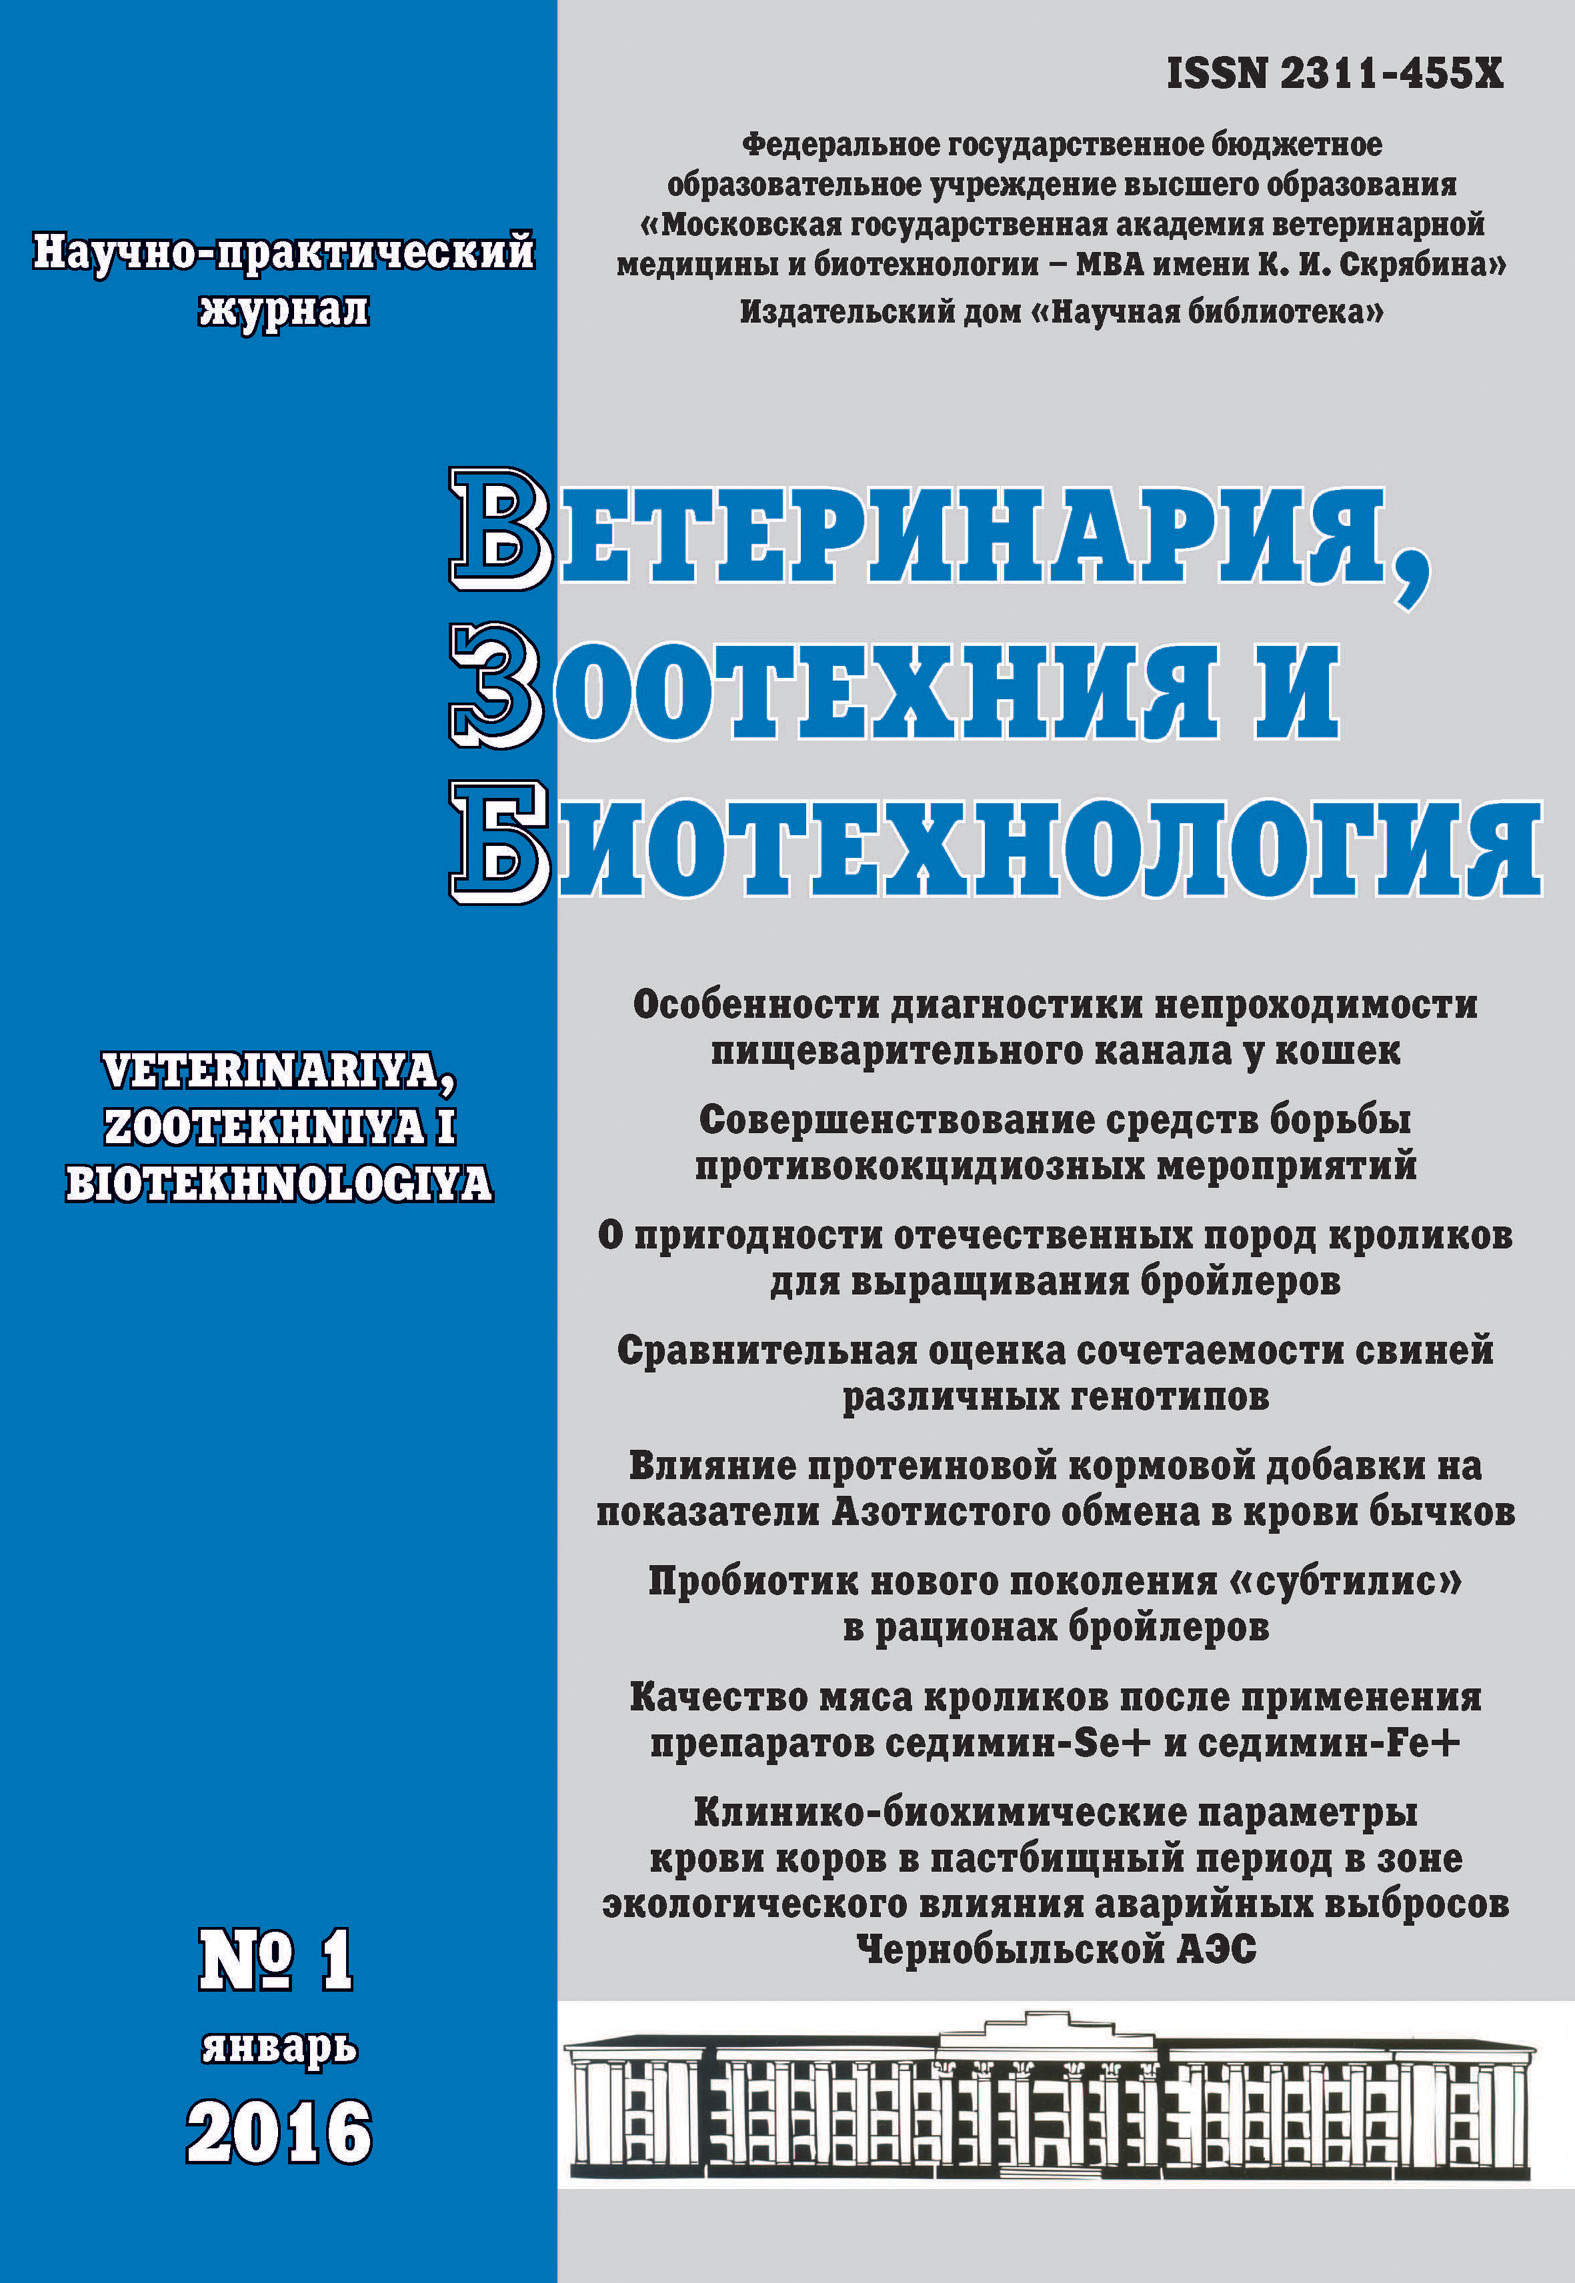 Ветеринария, зоотехния и биотехнология №1 2016